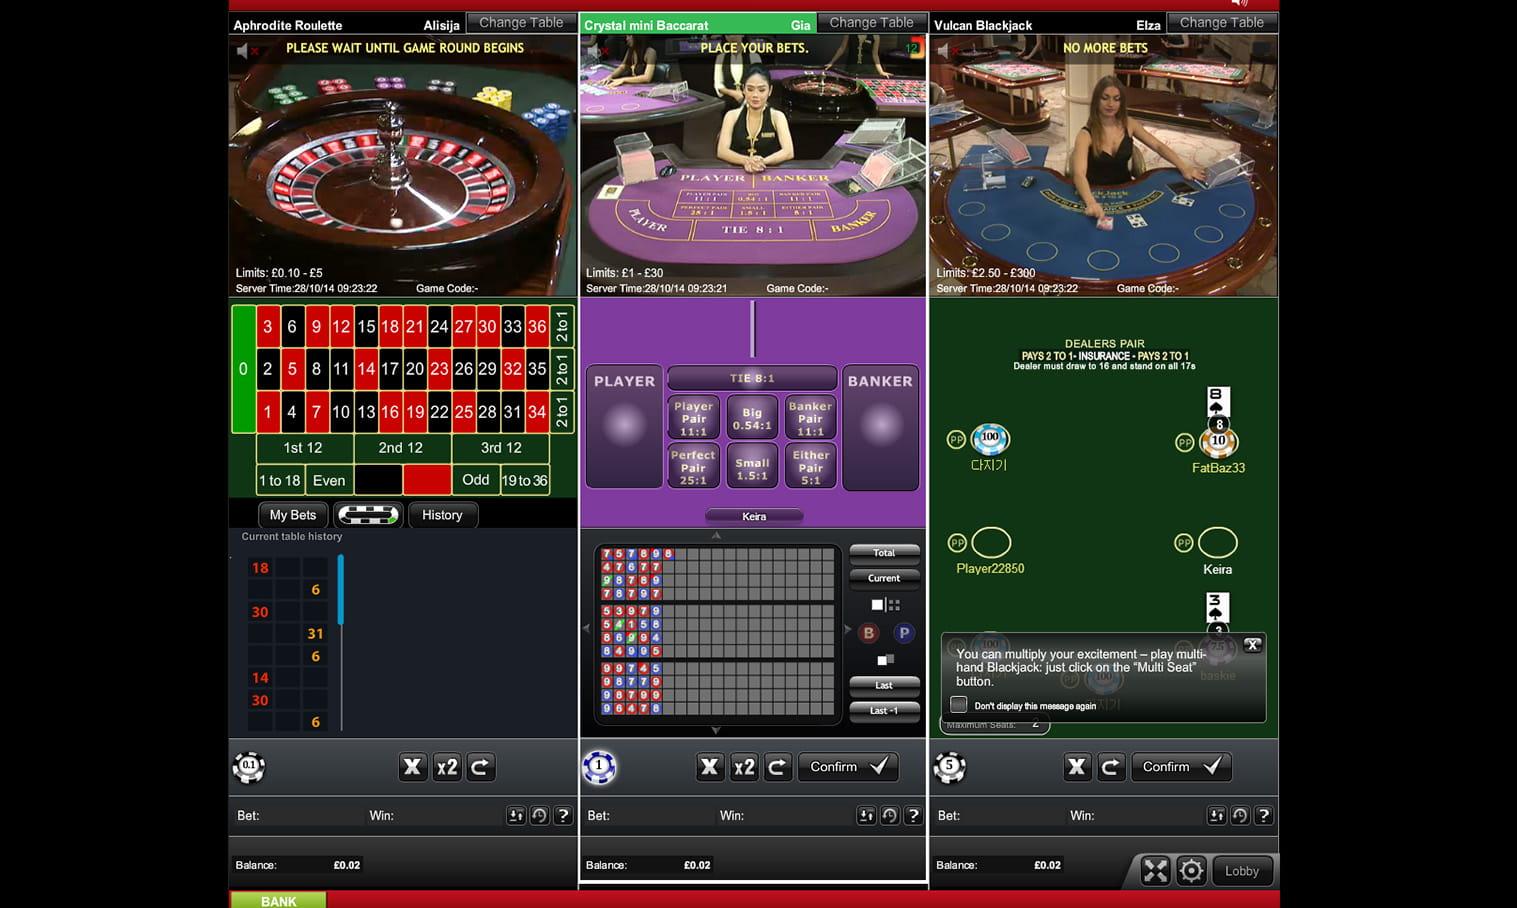 Go Casino Instand Play, Era Of Gods Slot, Casino Uk Online, Casino Rental Games